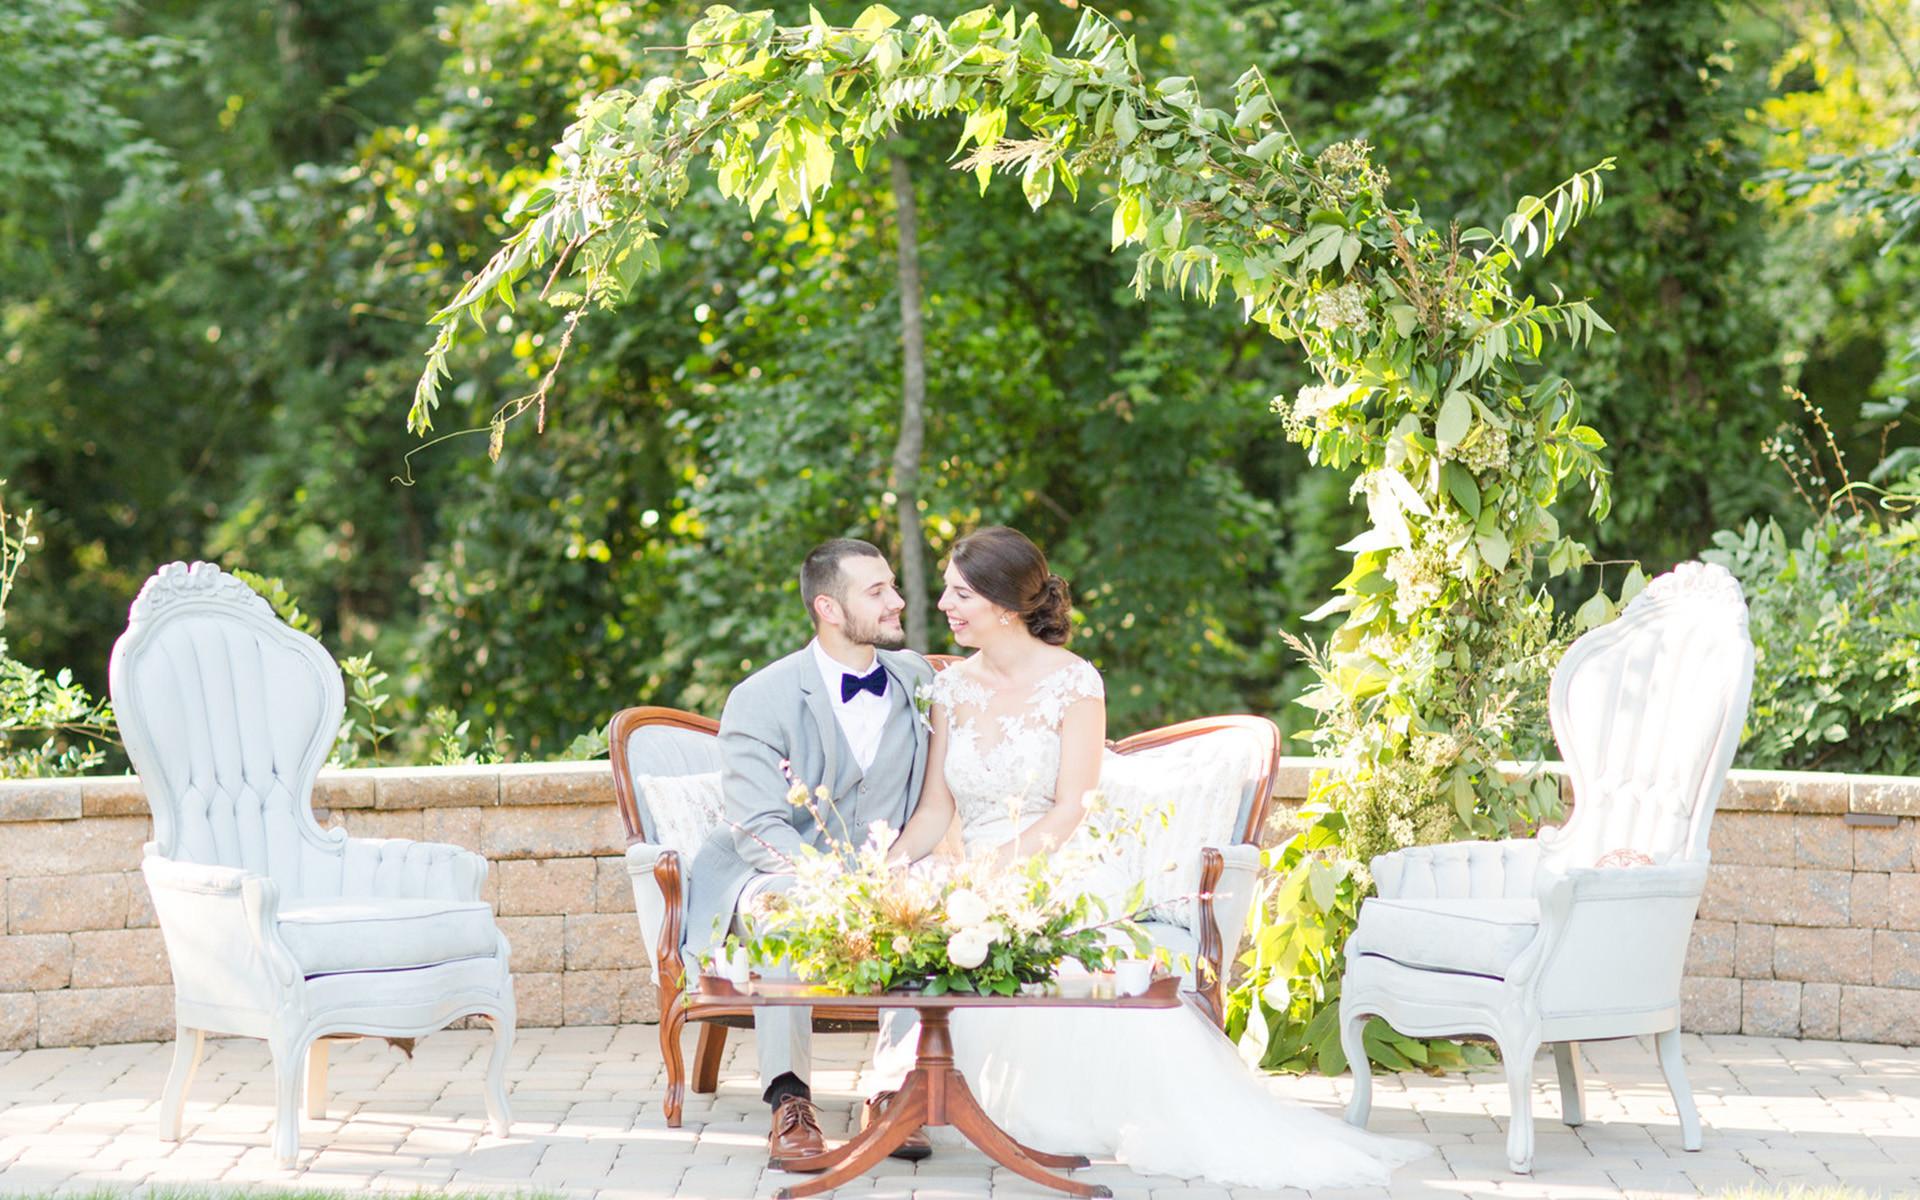 Whimsical Inspiration For A Garden Wedding